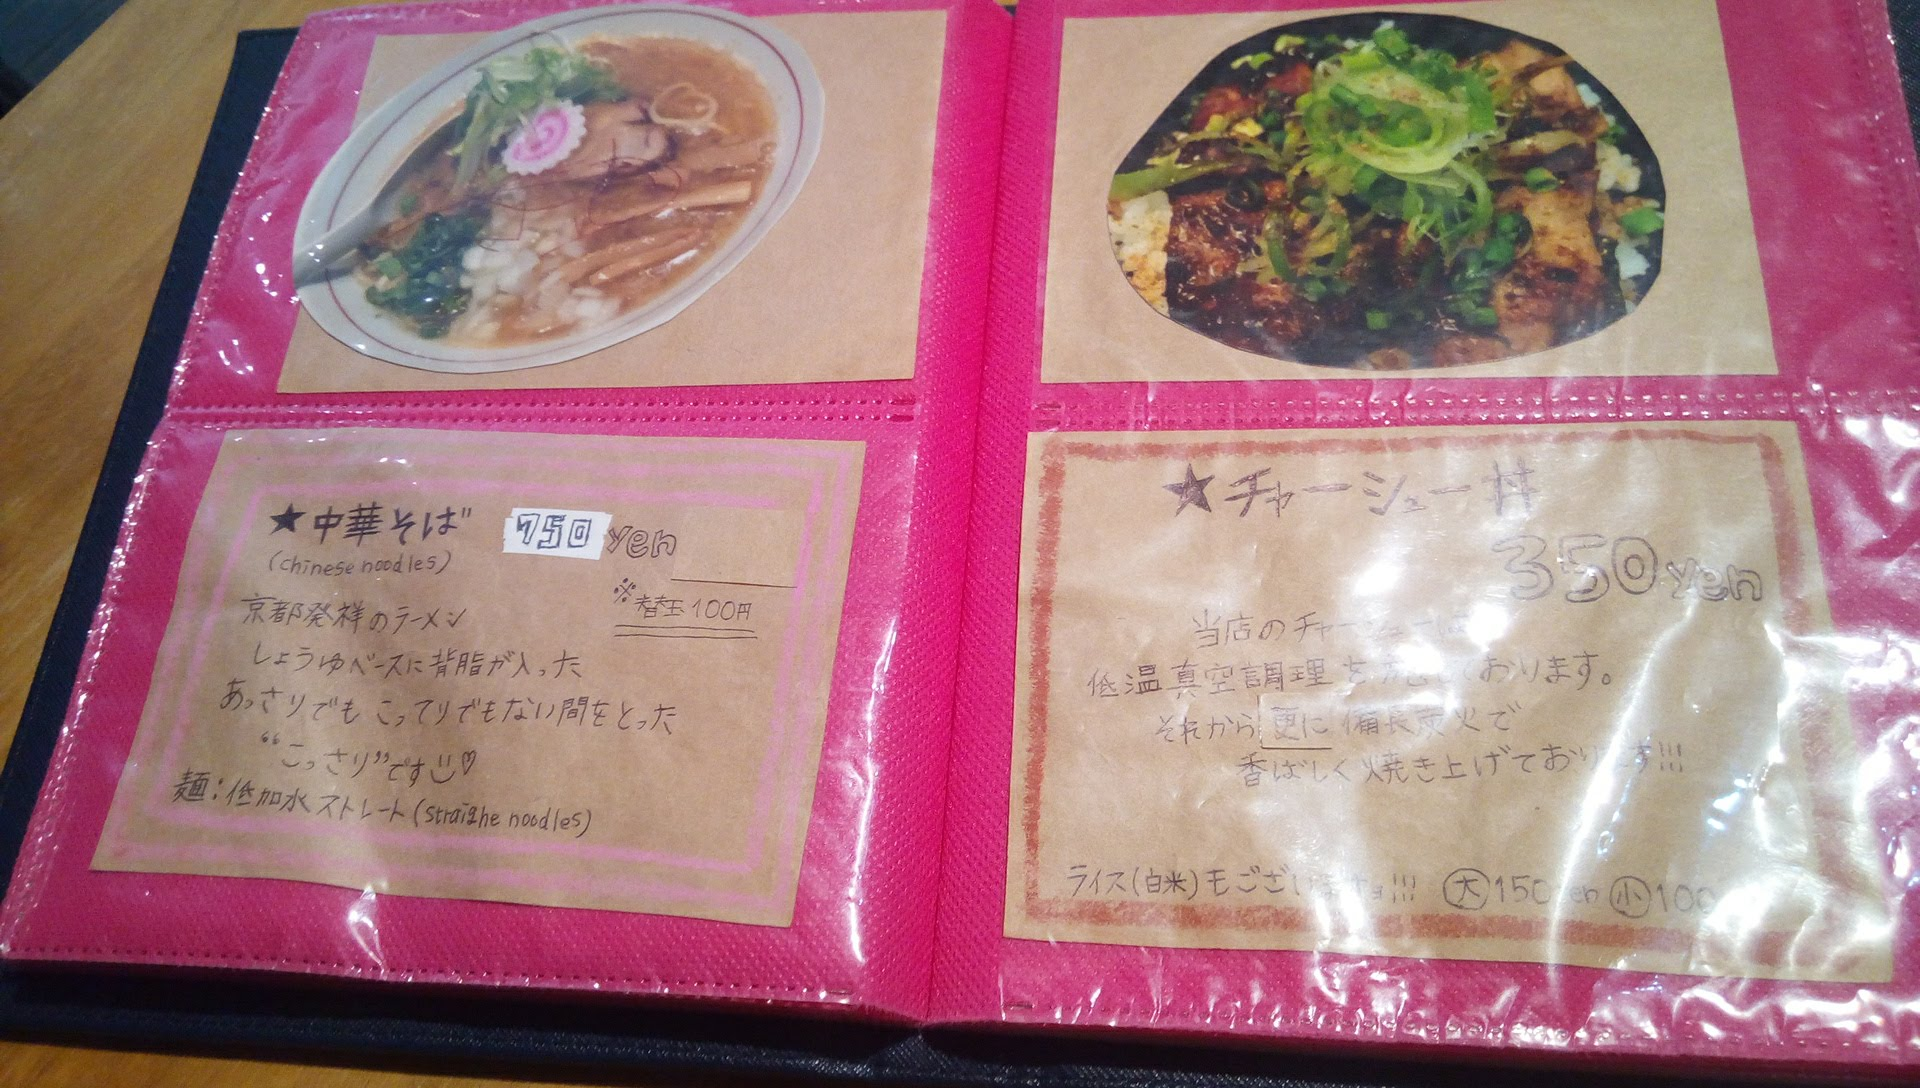 The menu of Menya-Gochi 5